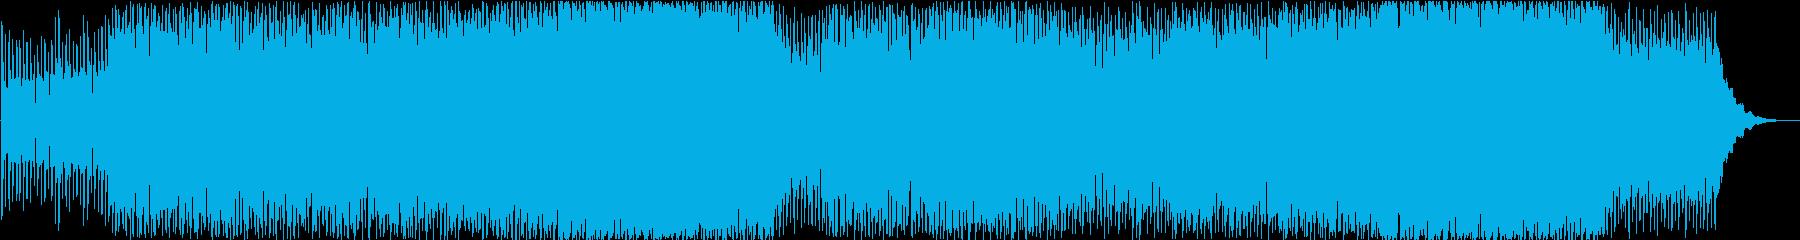 MALLの再生済みの波形